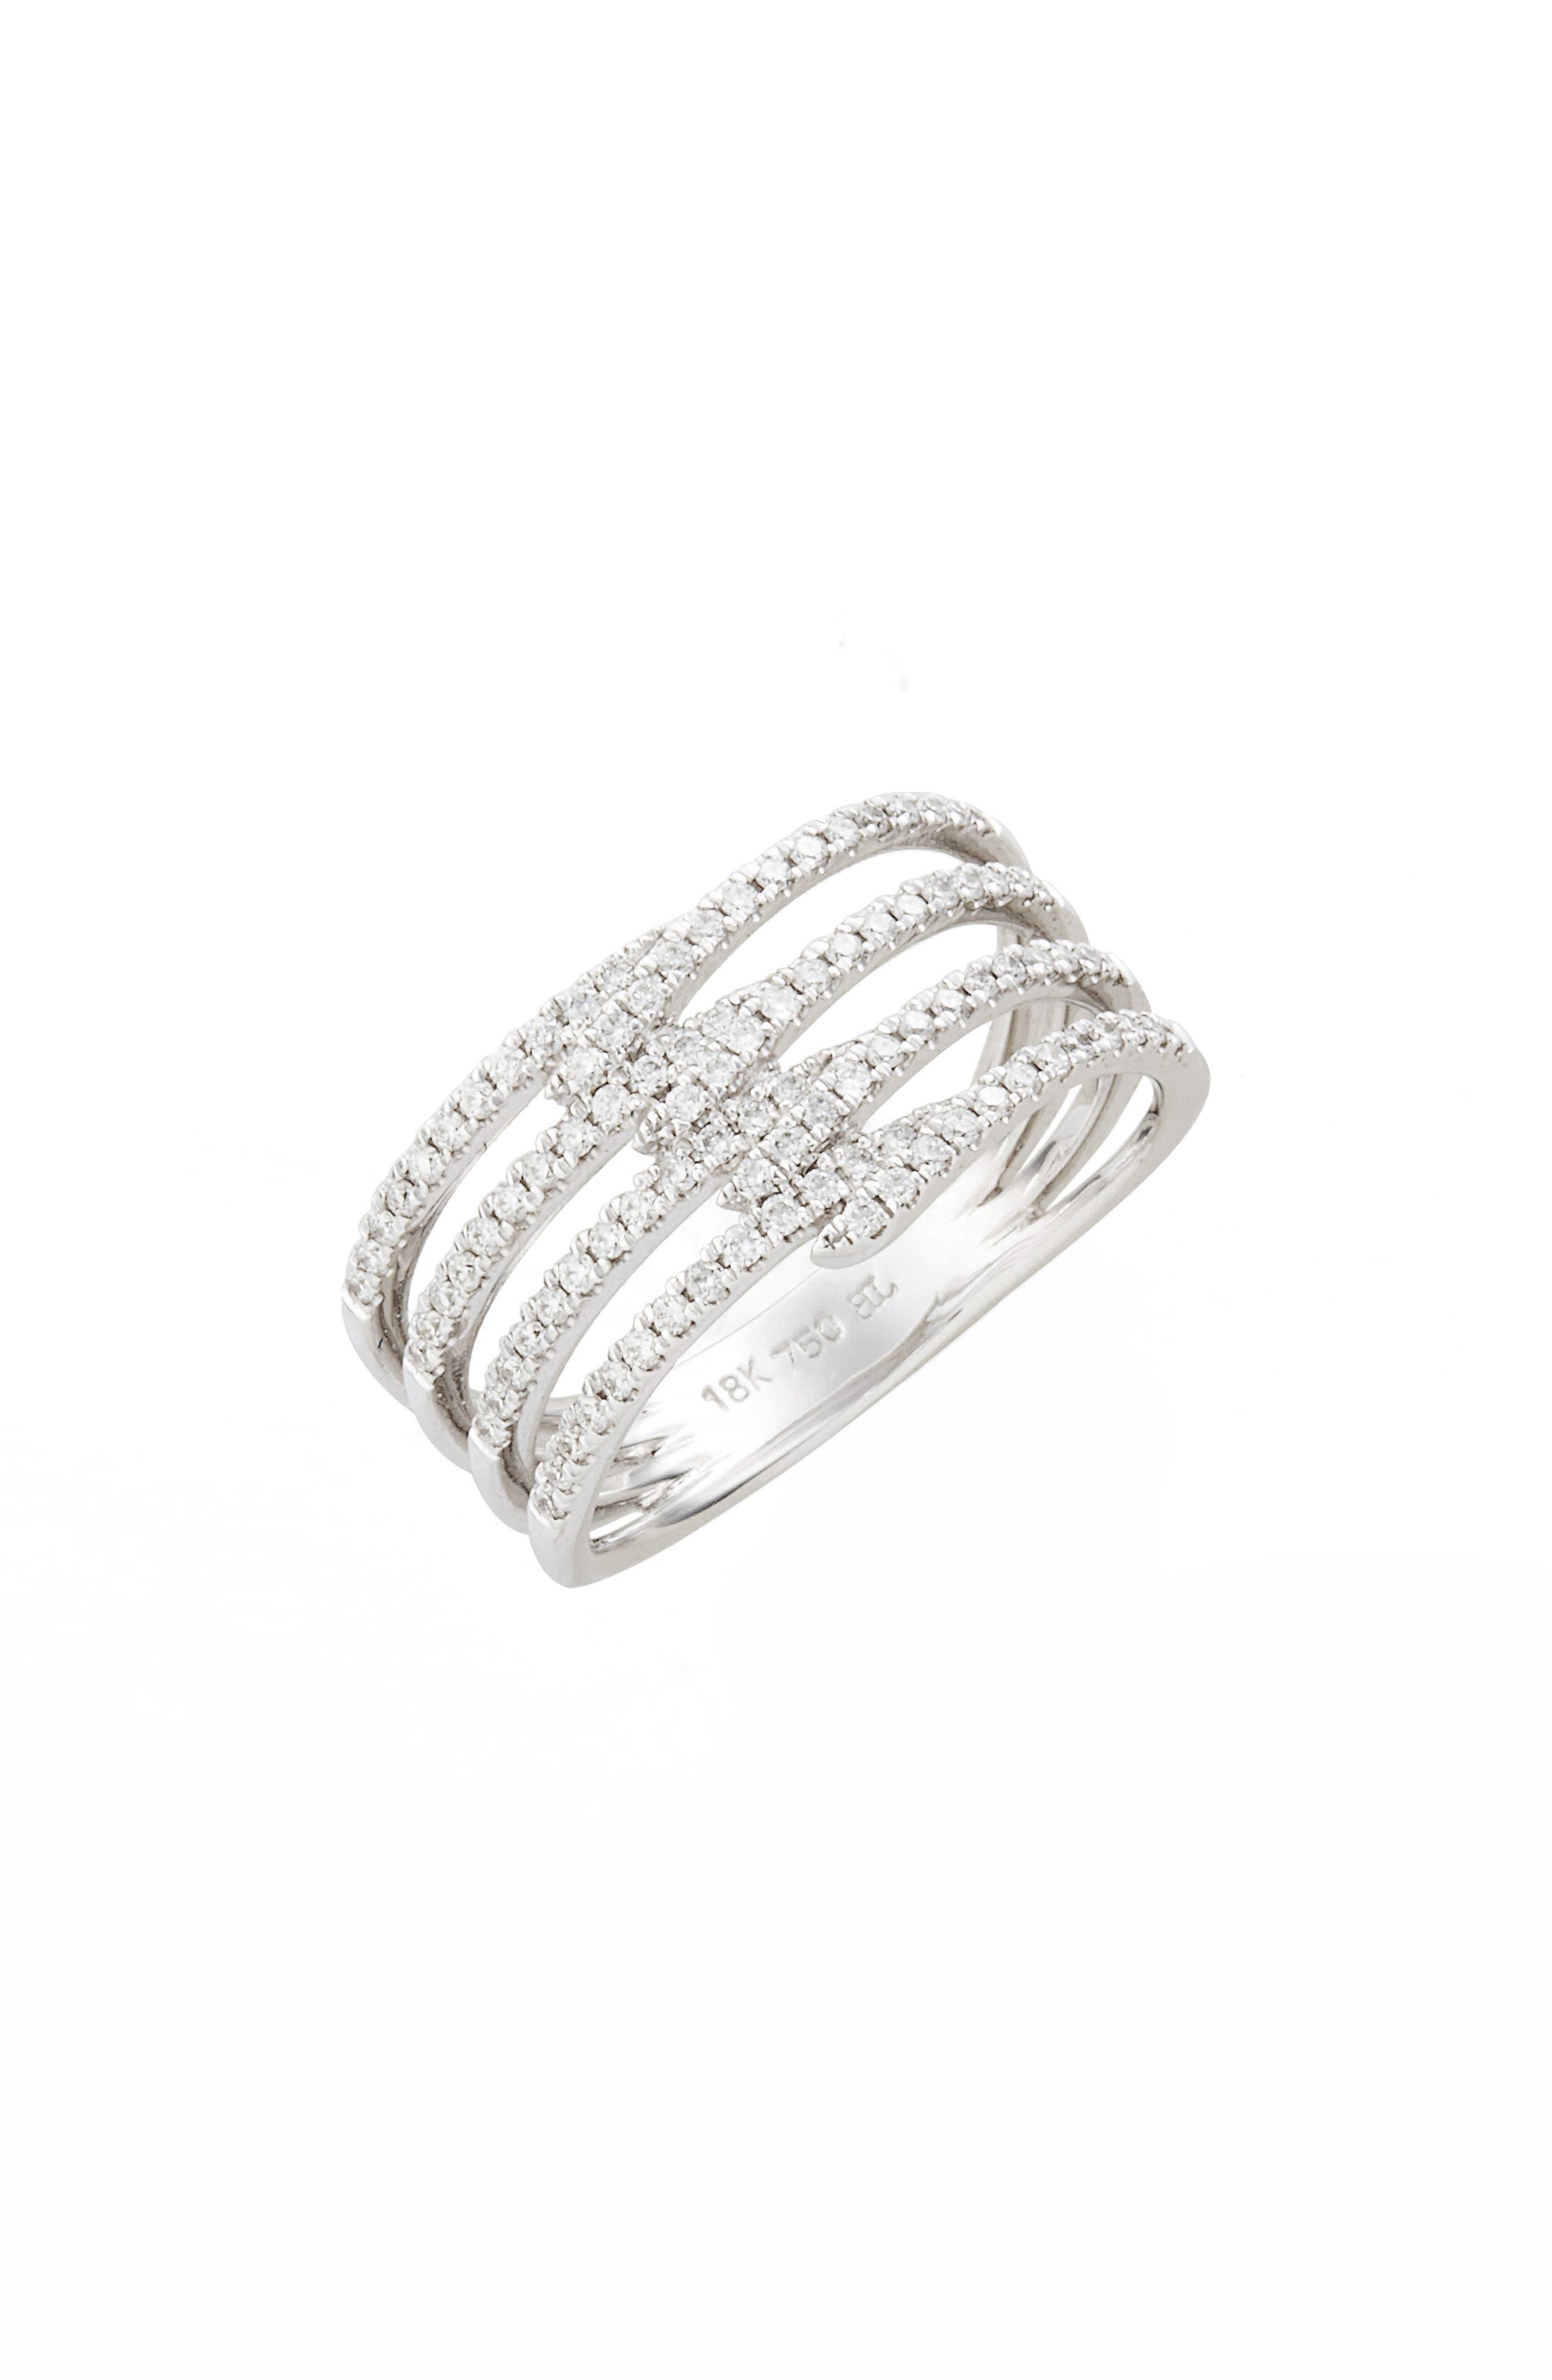 Main Image - Bony Levy Kiera Four-Row Diamond Ring (Nordstrom Exclusive)